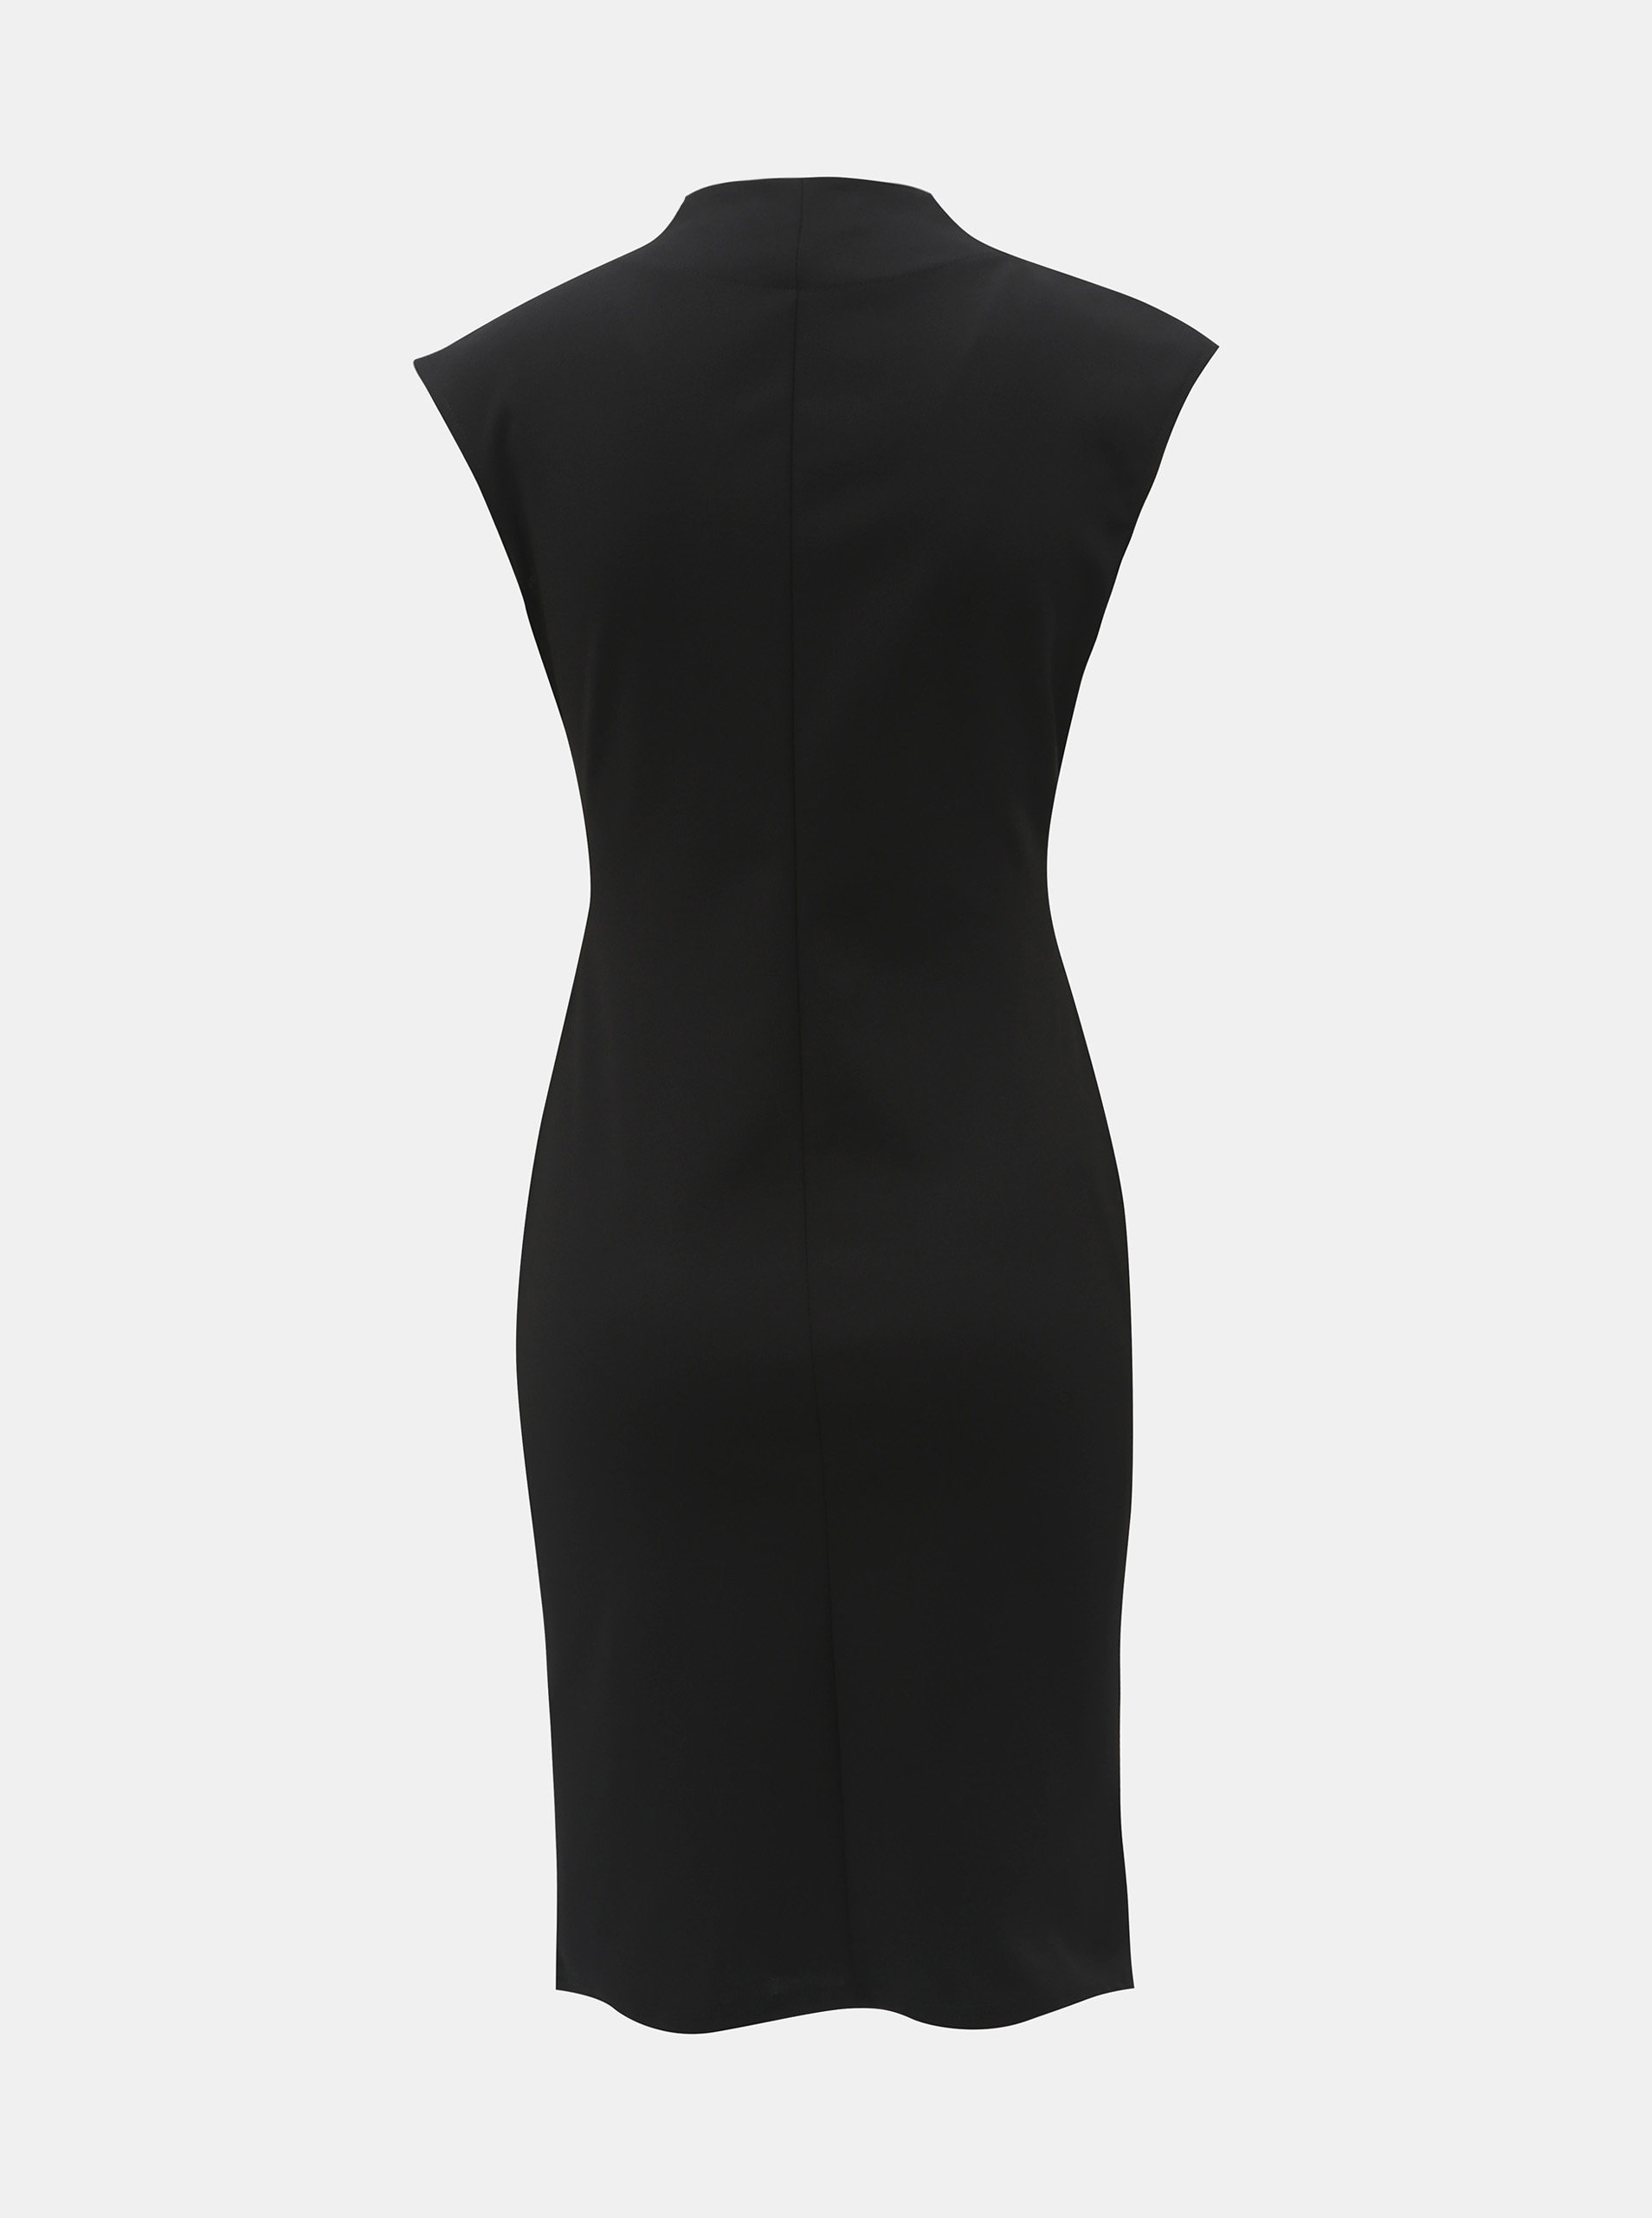 65e8a4fc6e1 Černé pouzdrové šaty s řasením na bocích Dorothy Perkins Riley ...